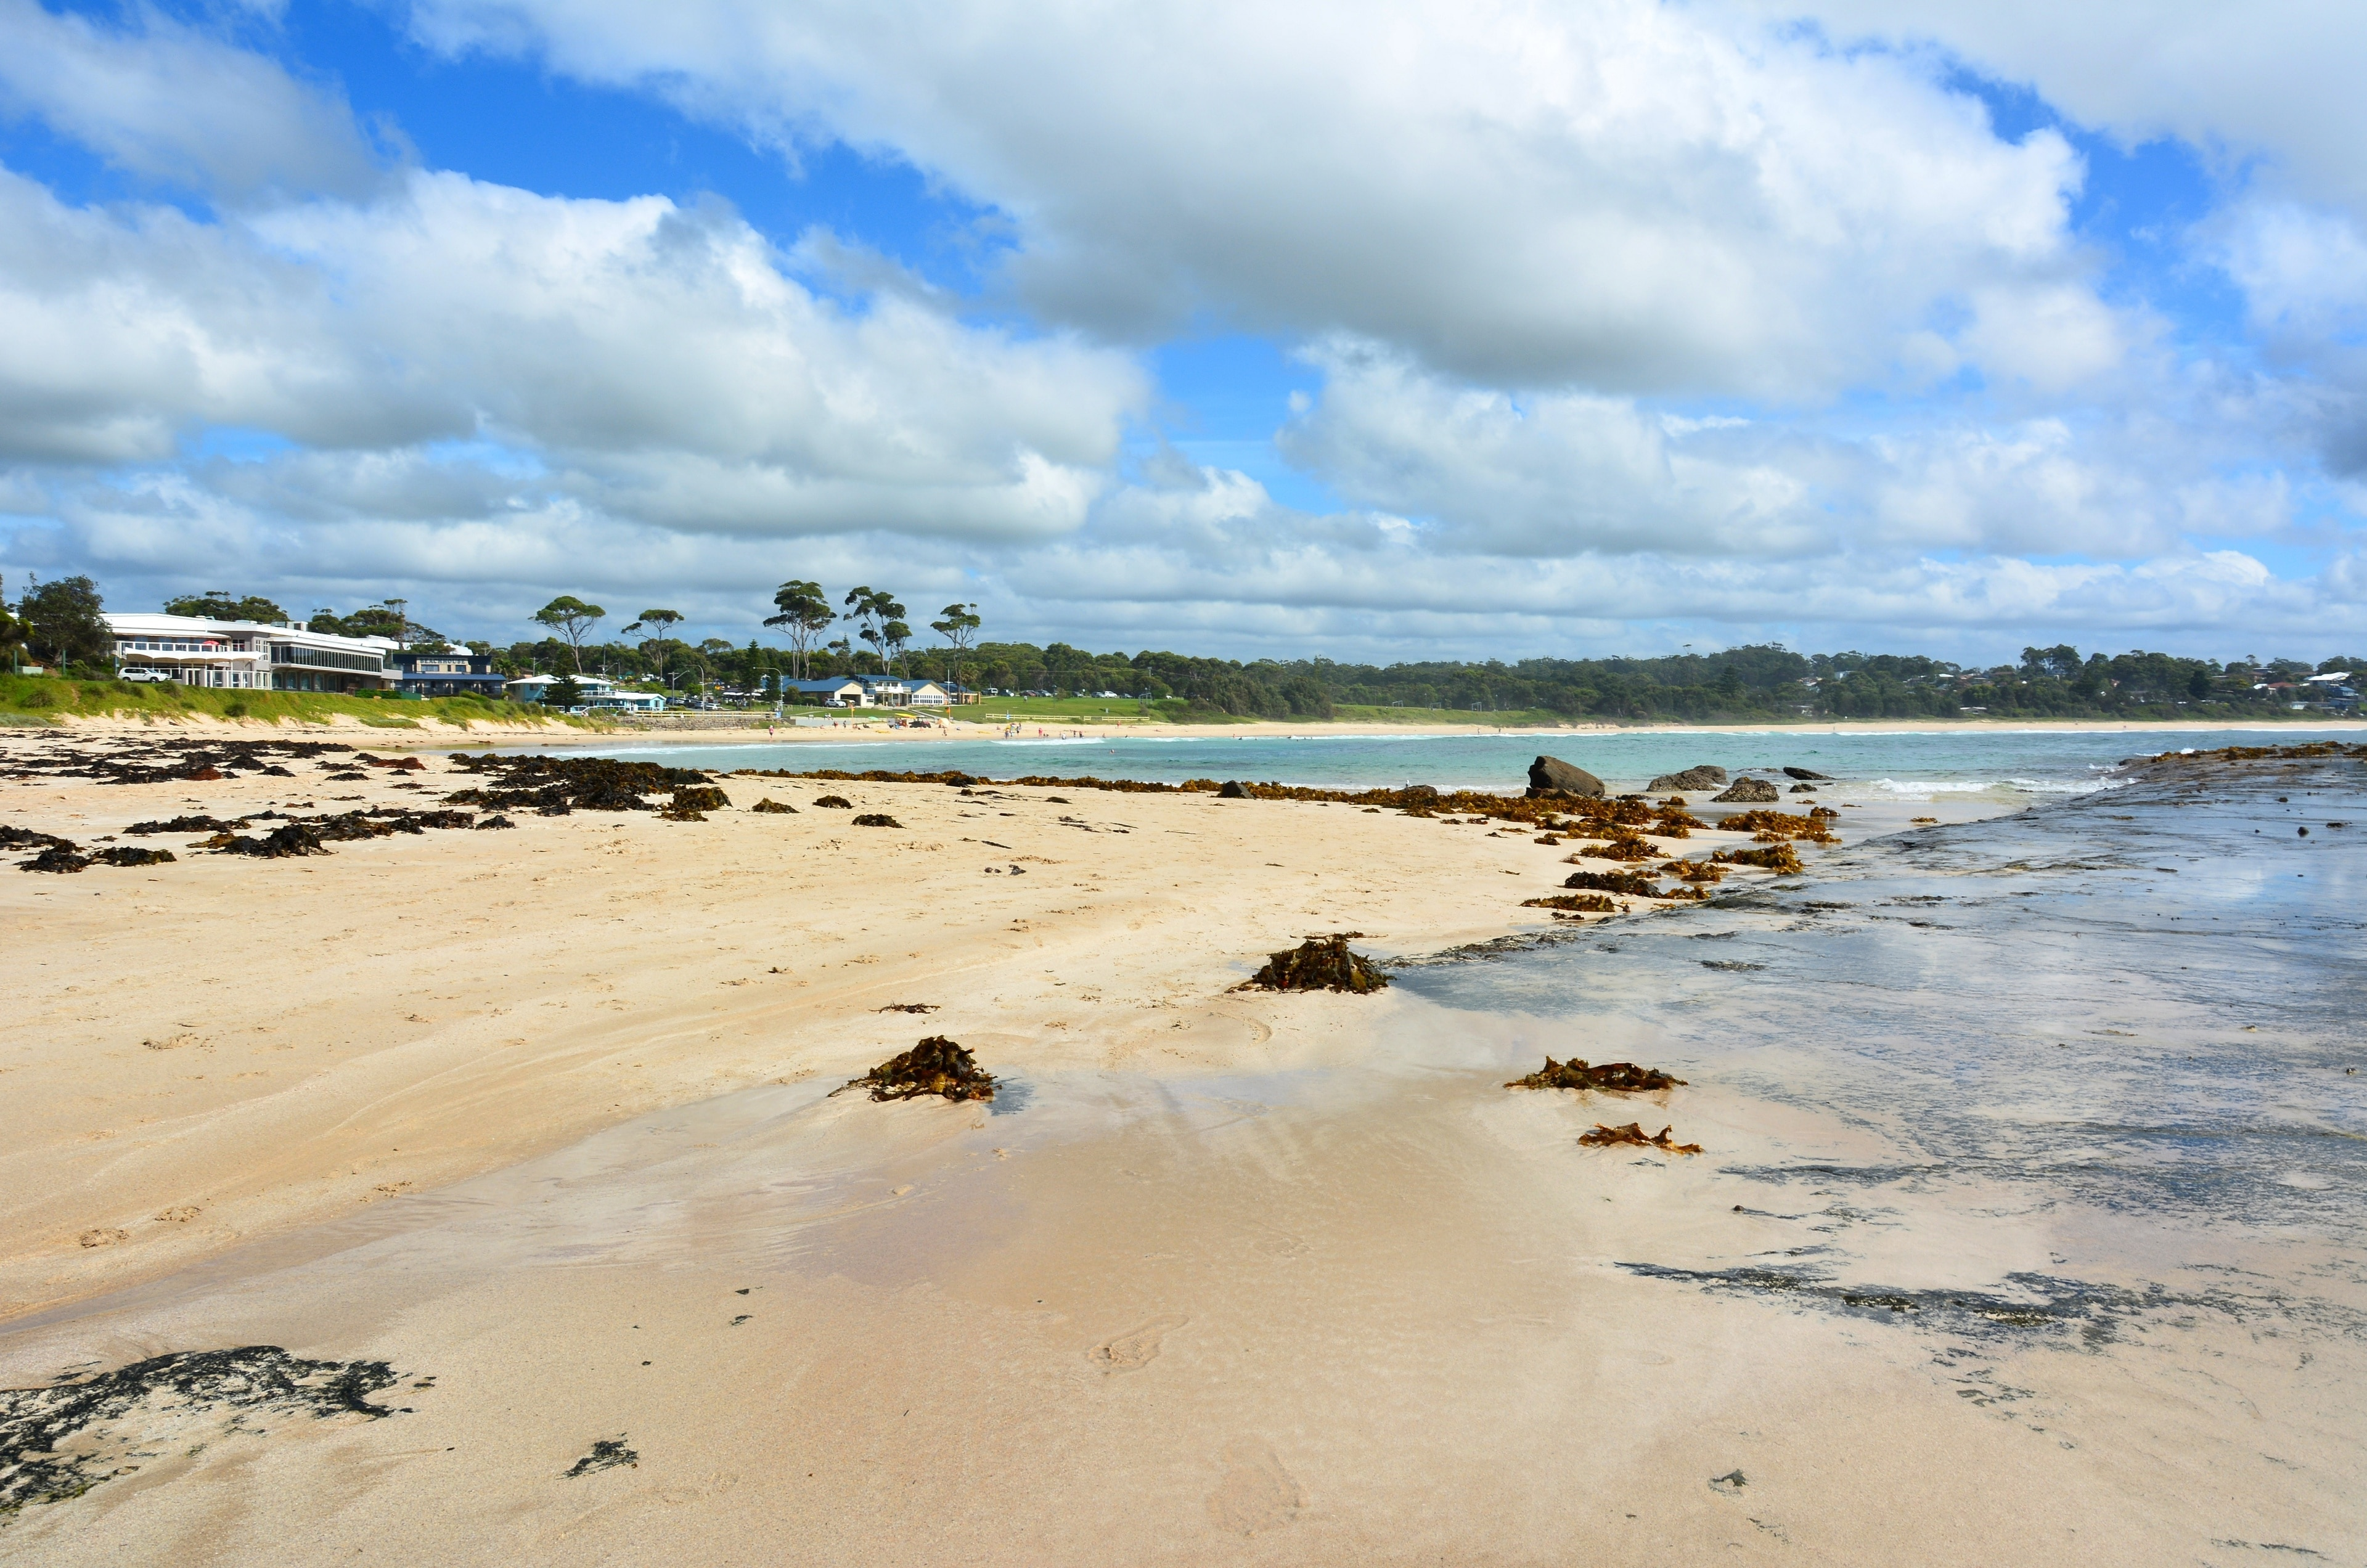 Mollymook Beach, Ulladulla, New South Wales, Australia